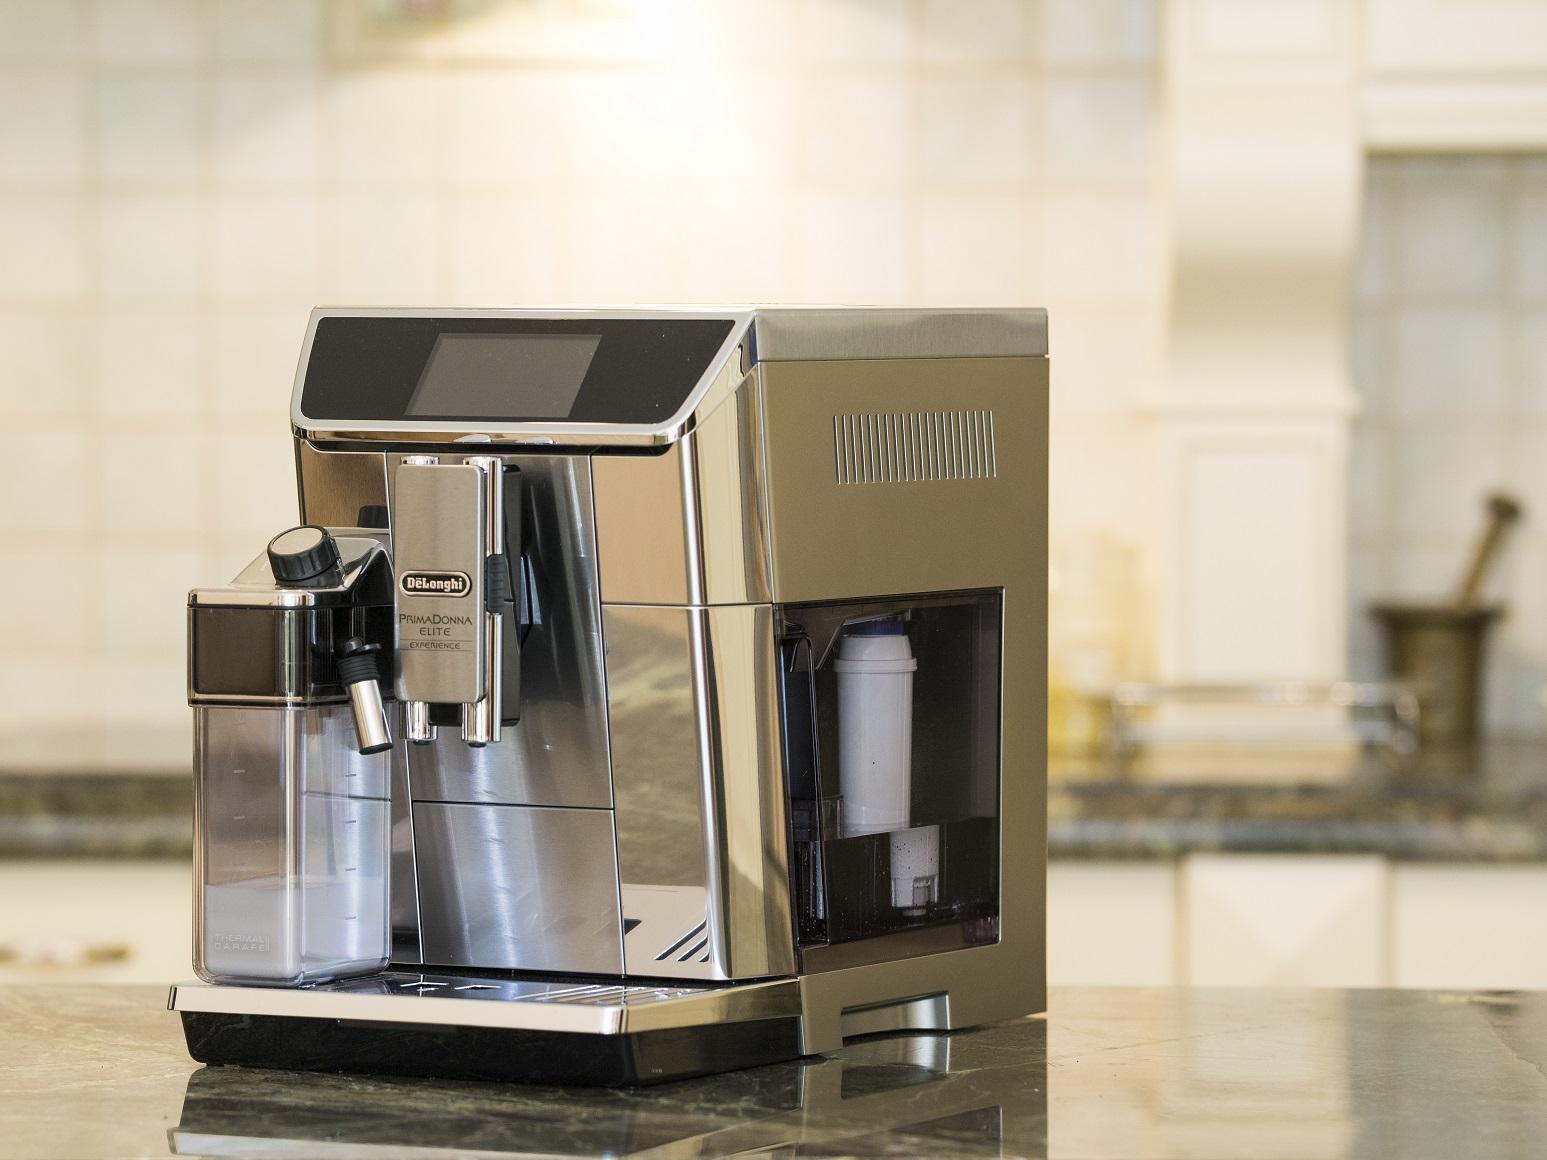 Ekspres automatyczny De'Longhi ECAM 650.85.MS – Primadonna Elite Experience